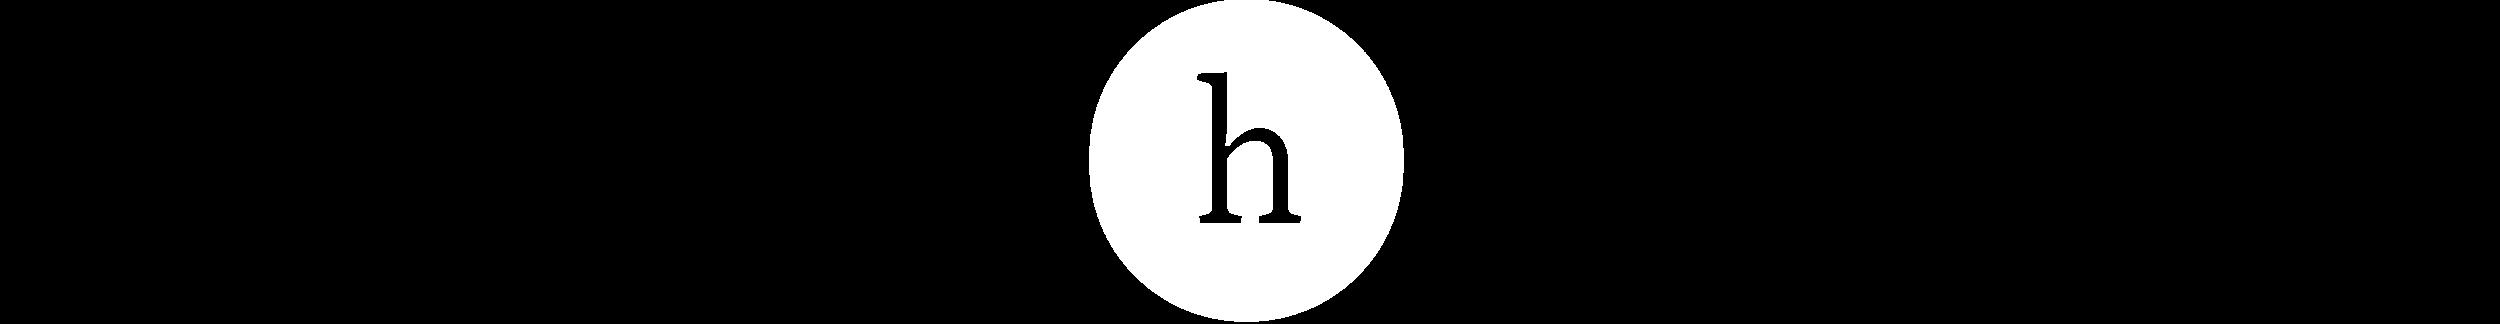 Hellohappen_White-transparent_favicon